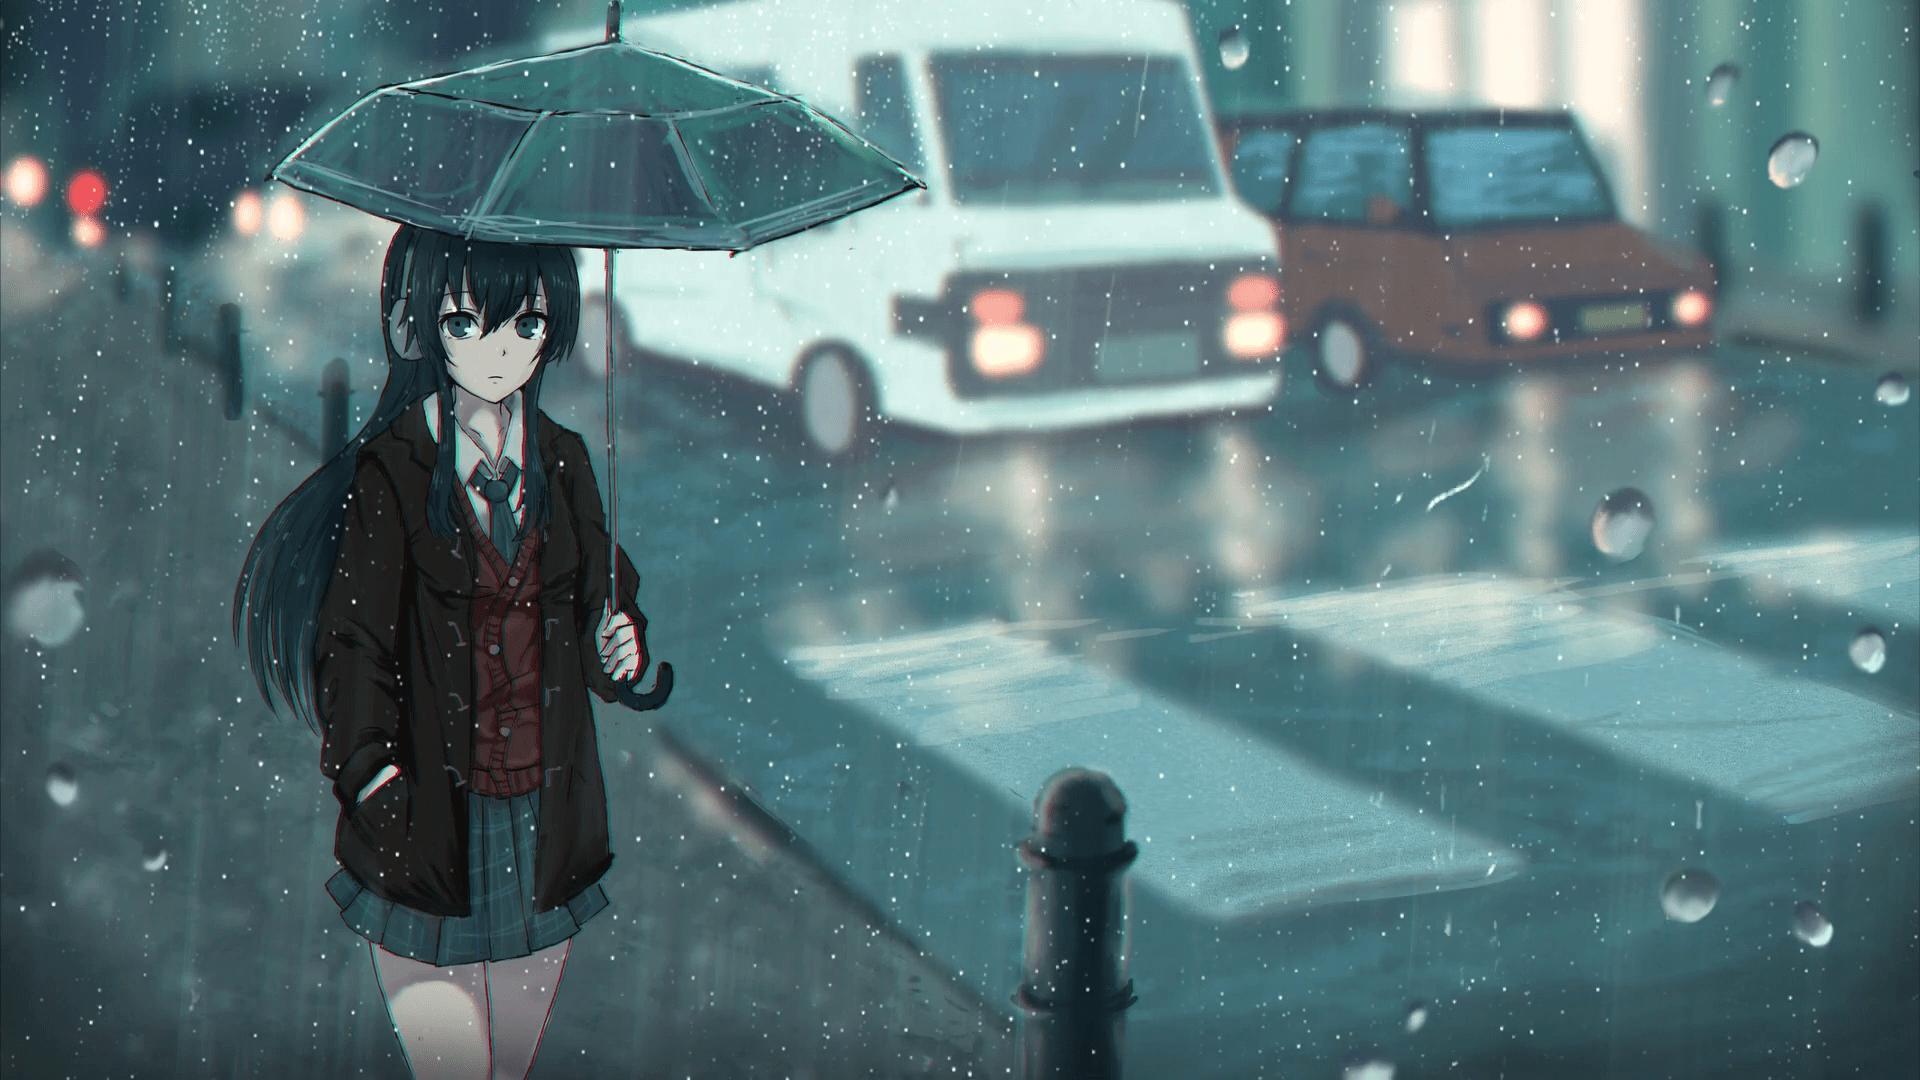 Rain Anime Hd Wallpapers Top Free Rain Anime Hd Backgrounds Wallpaperaccess